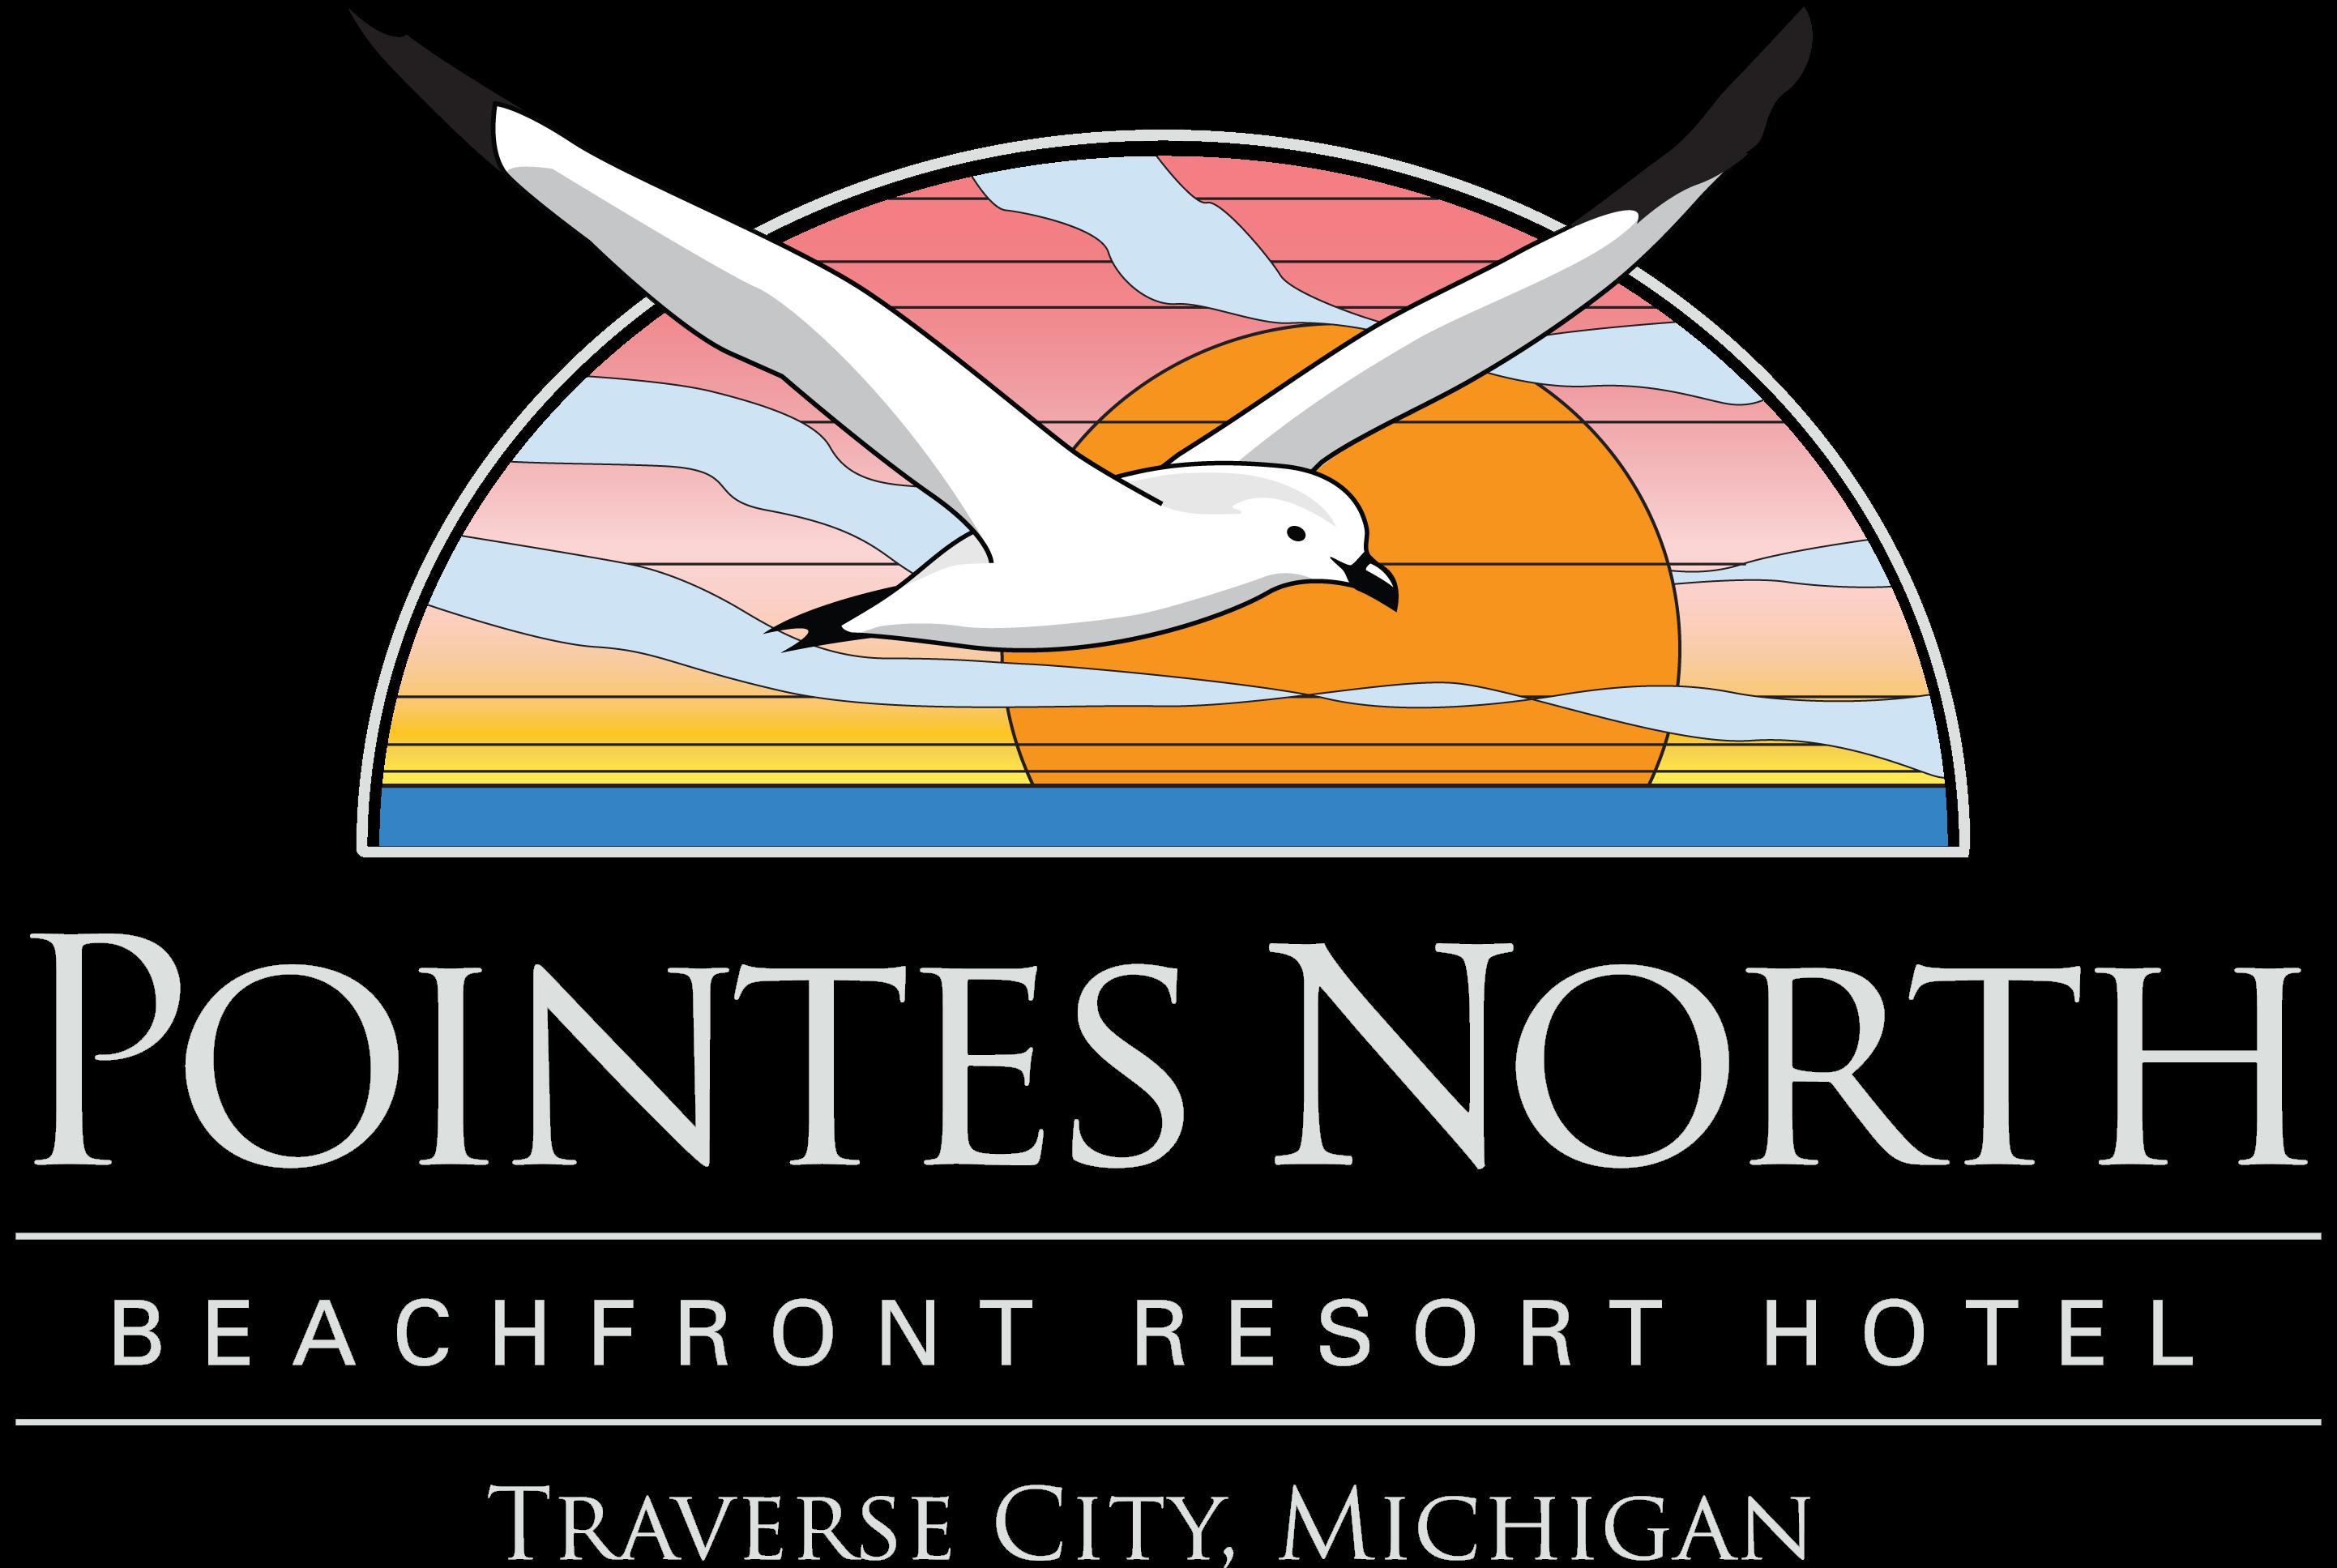 Logo for Pointes North Beachfront Resort Hotel